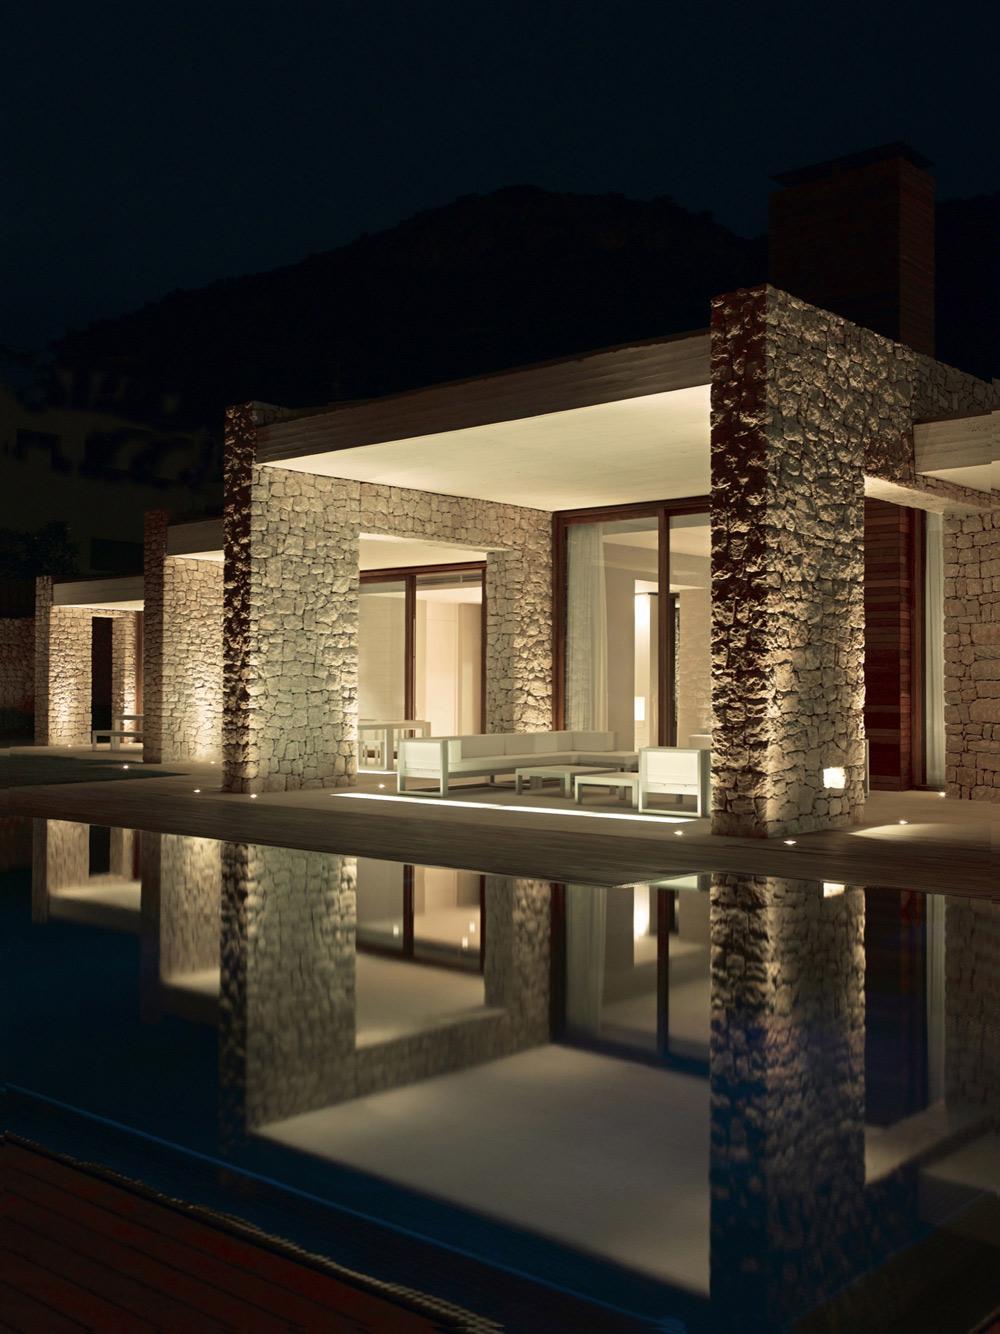 Balcony, Outdoor Furniture, Contemporary Home in Monasterios, Spain